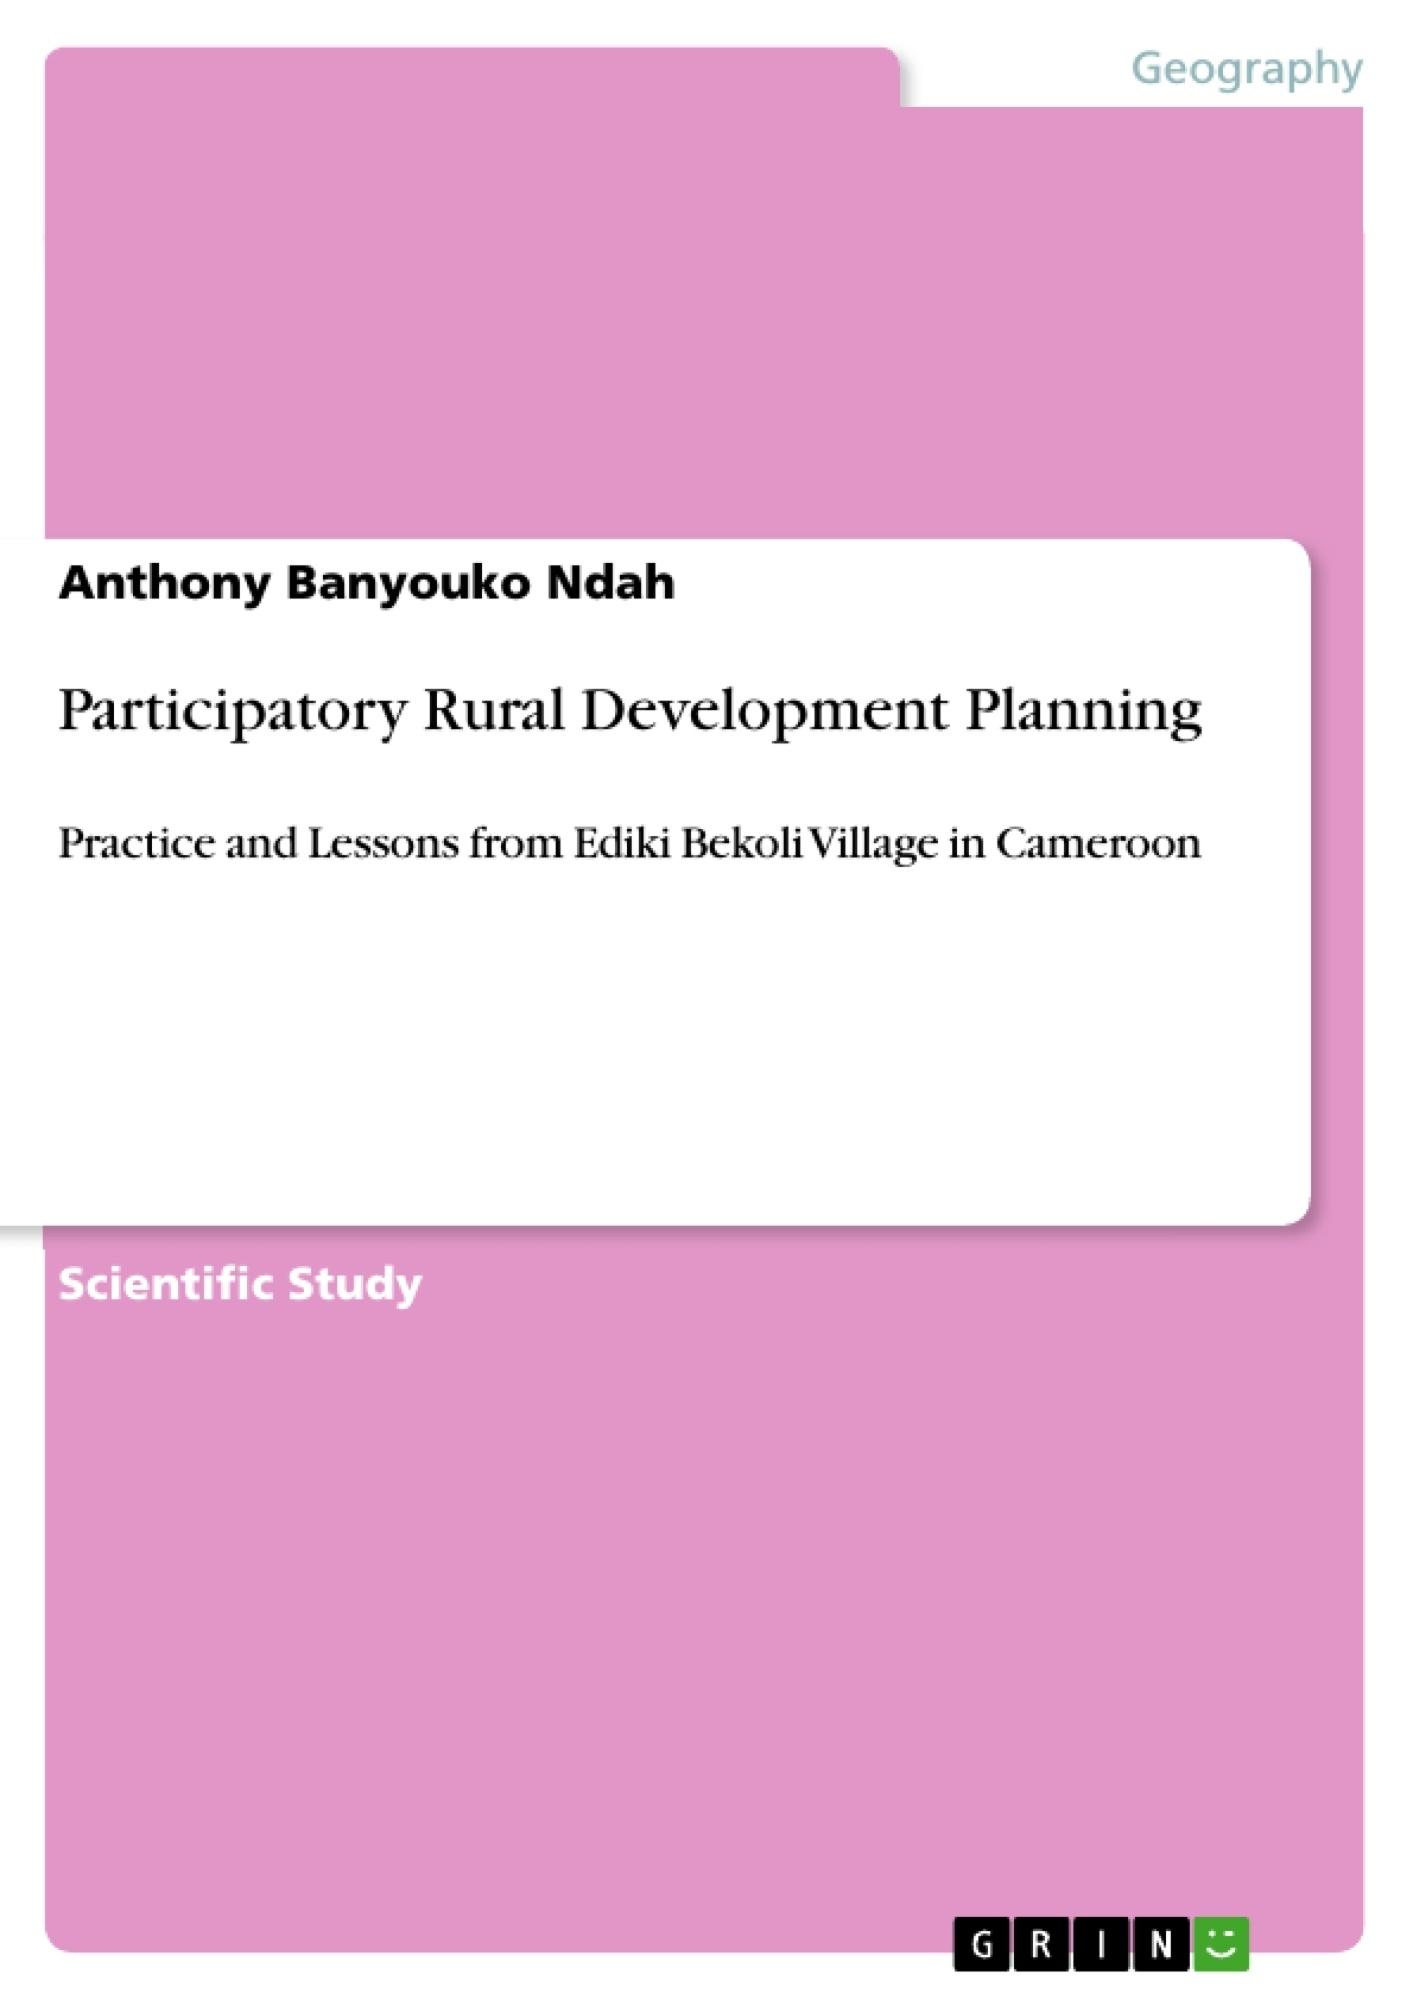 Title: Participatory Rural Development Planning